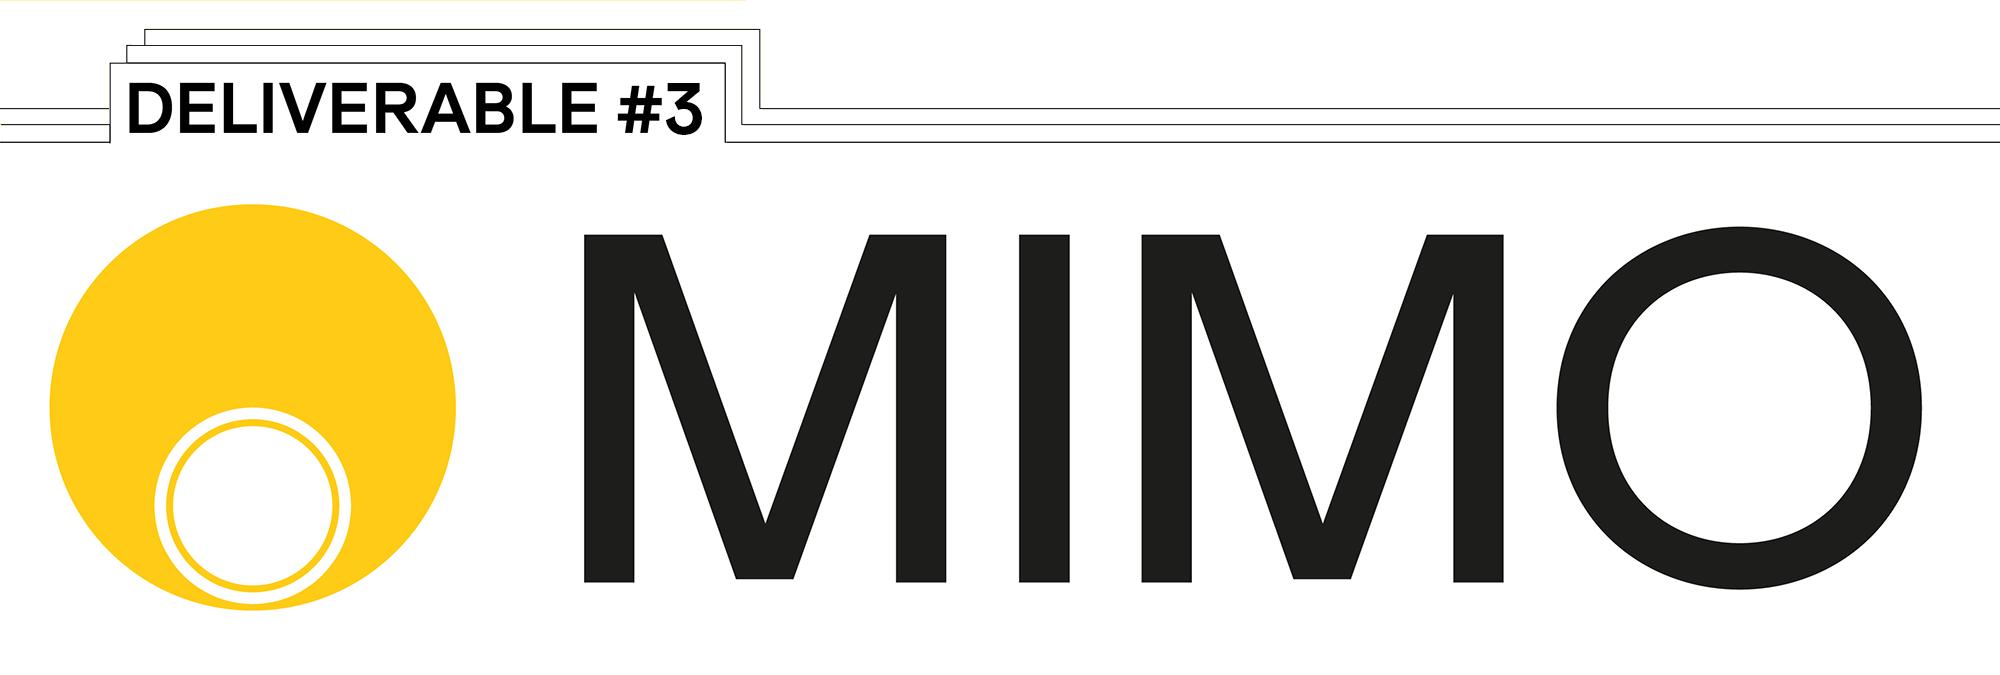 deliverable-3-sde21-mimo